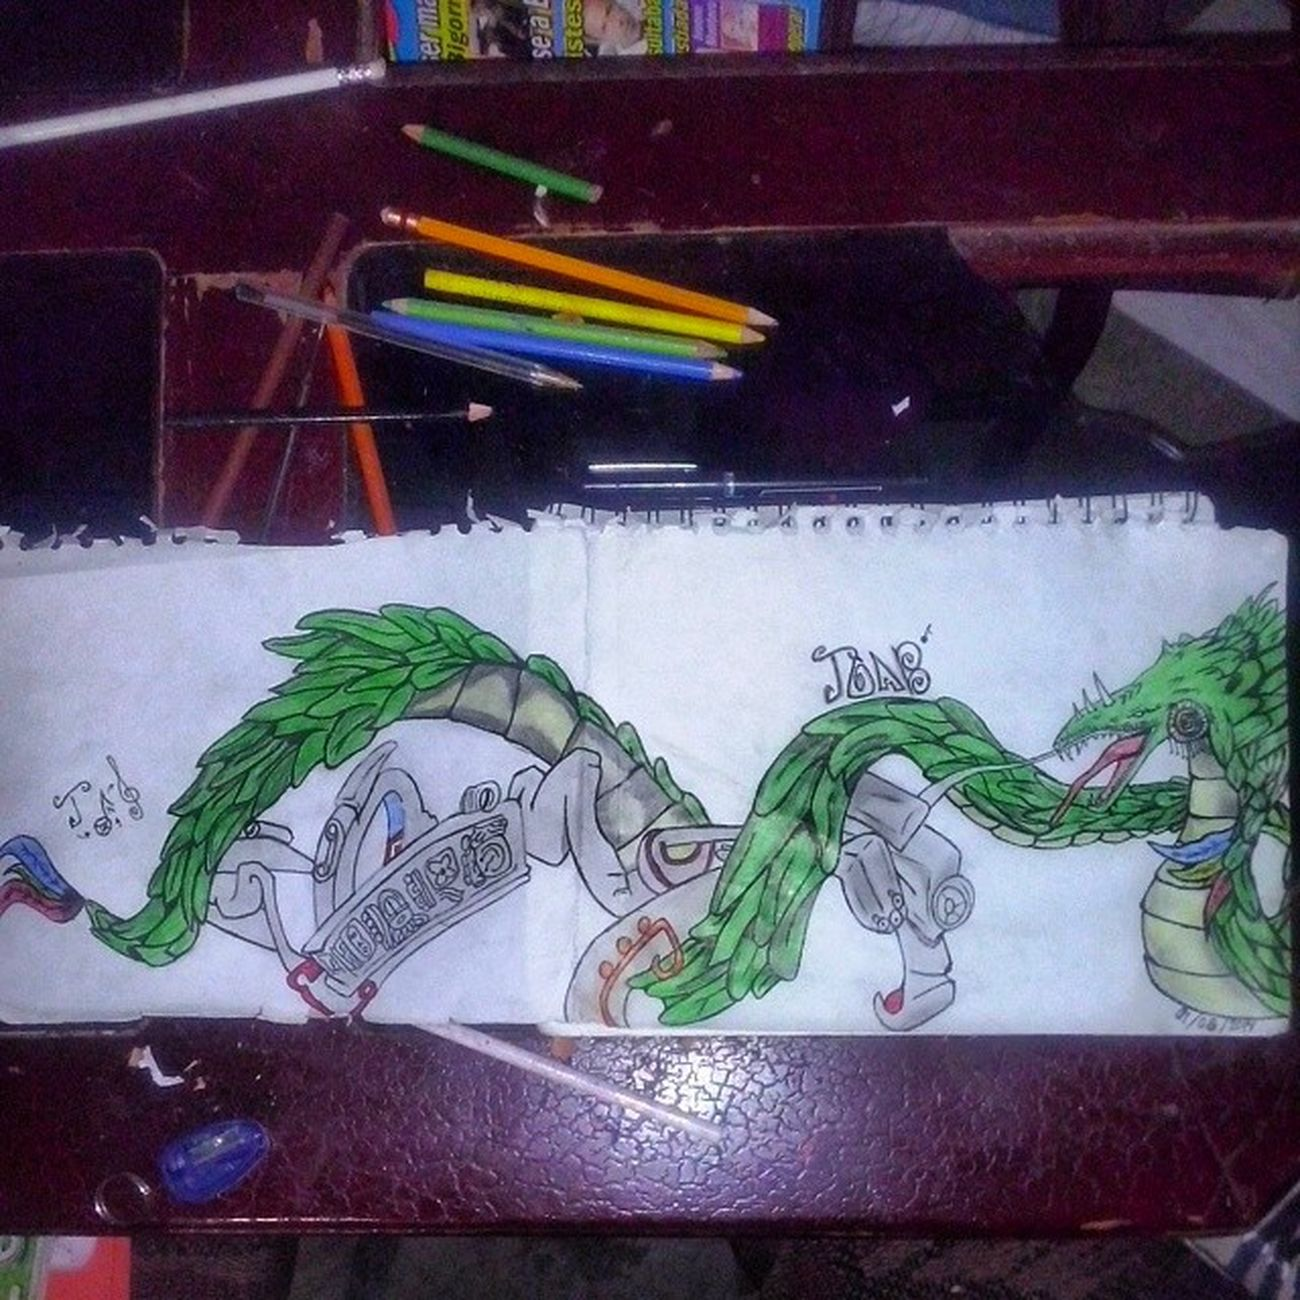 La Mente Detras Del Lapiz Mayanculture Artistic Draw Art, Drawing, Creativity Dibujo A Lapiz Drawingtime Mis Dibujos Drawing Dibujo